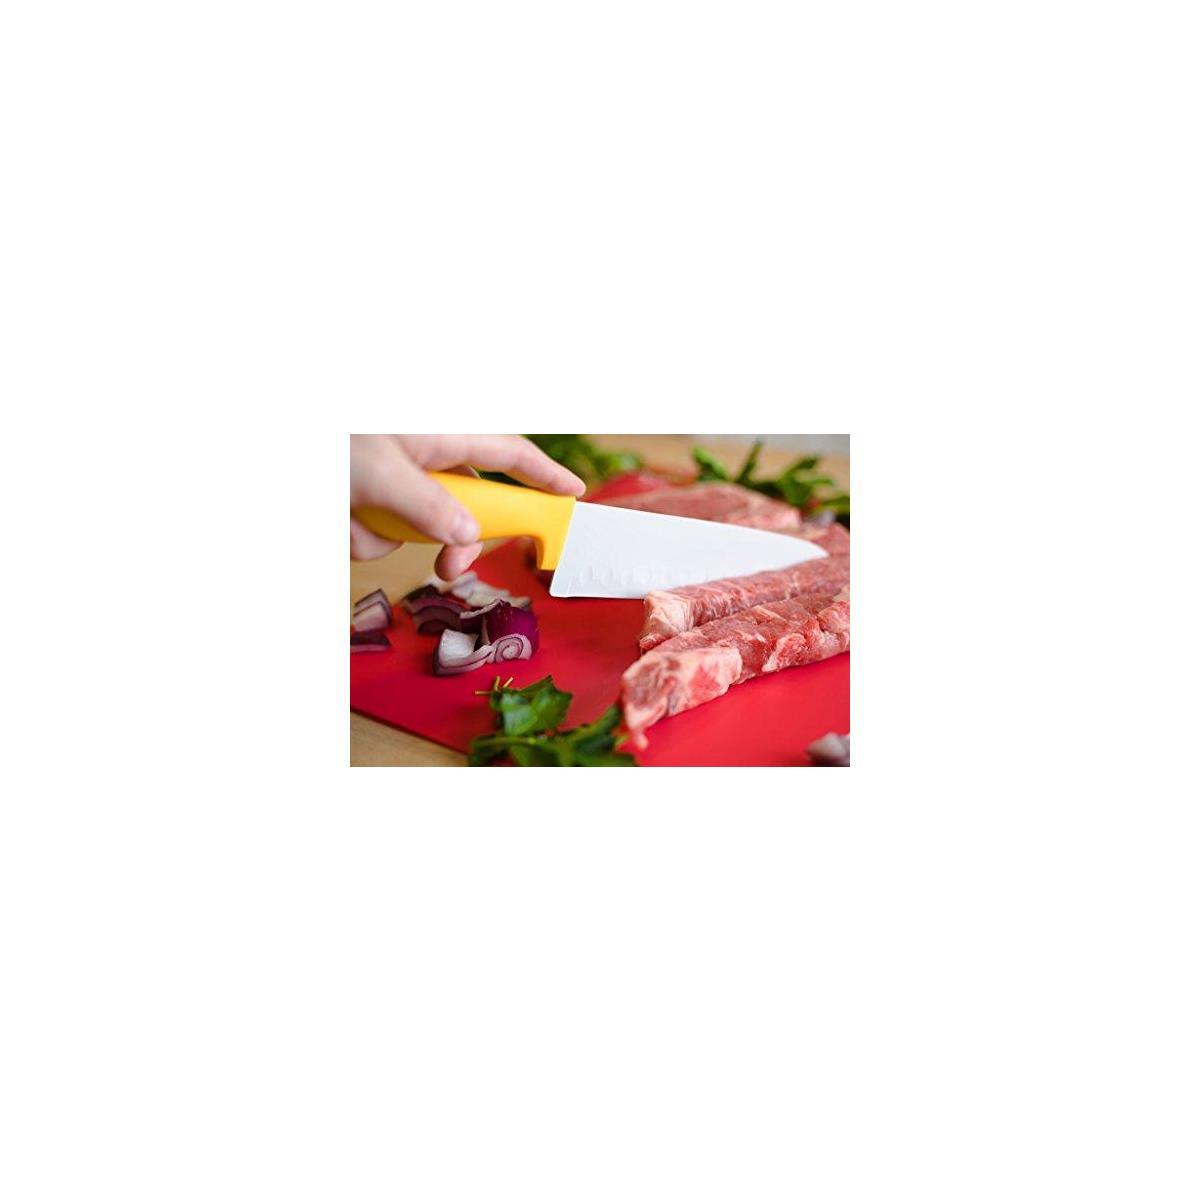 12 Piece Steel Color Knife Set - 6 Steel Dishwasher Safe Kitchen Knives with 6 Knife Sheath Covers - Chef Knife Sets with Bread, Slicer, Santoku, Utility and Paring Knives - Colored Knife Set